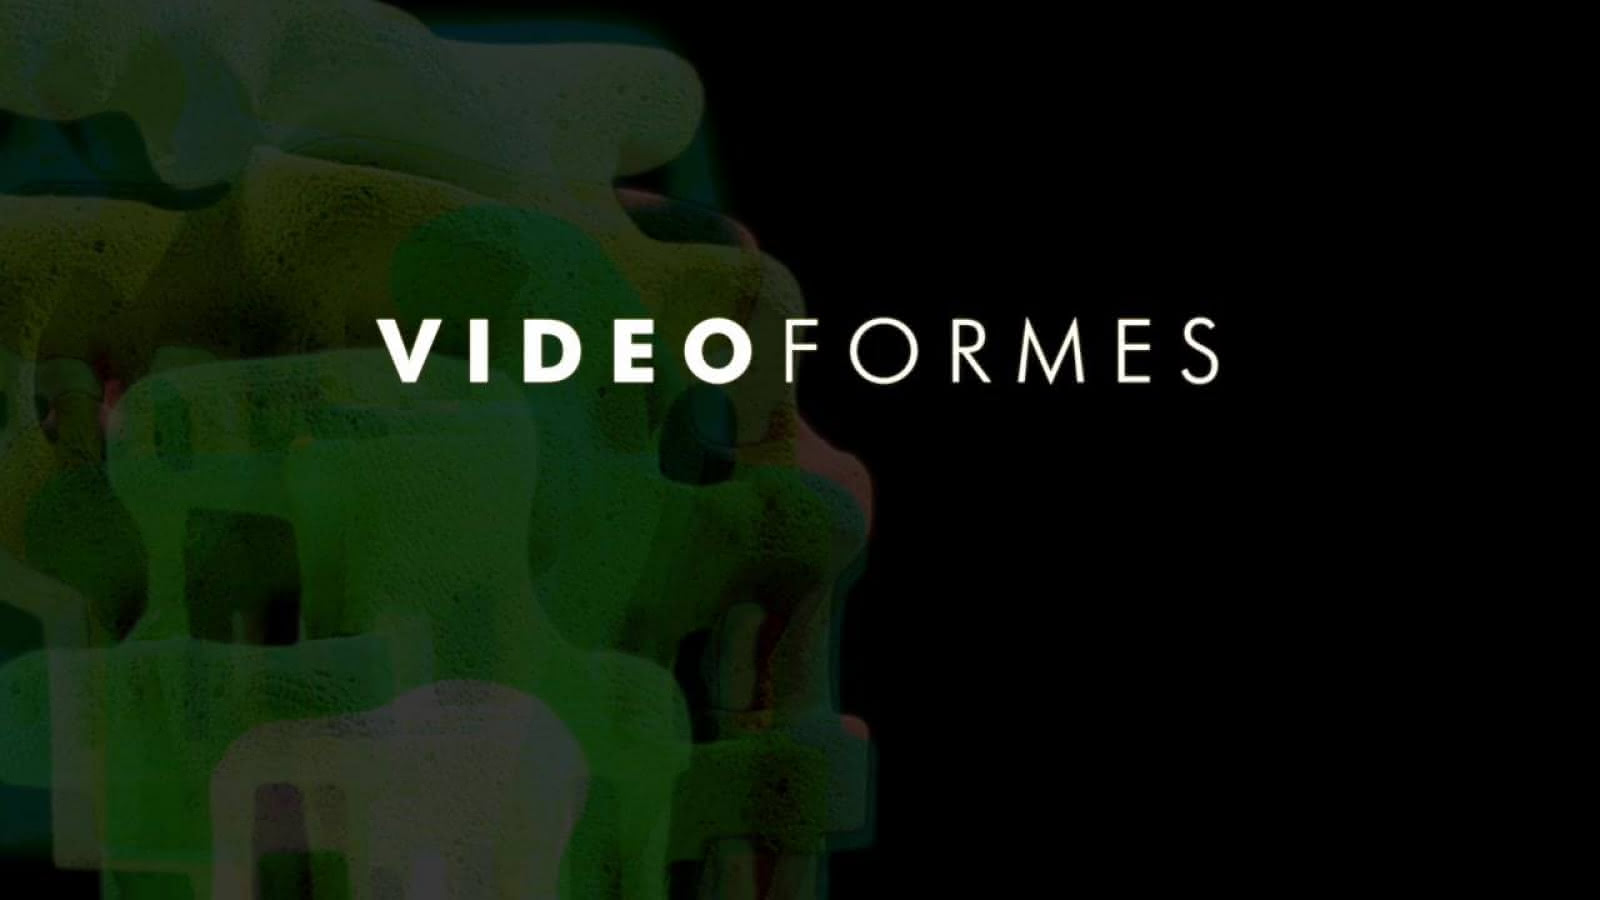 © Vidéoformes